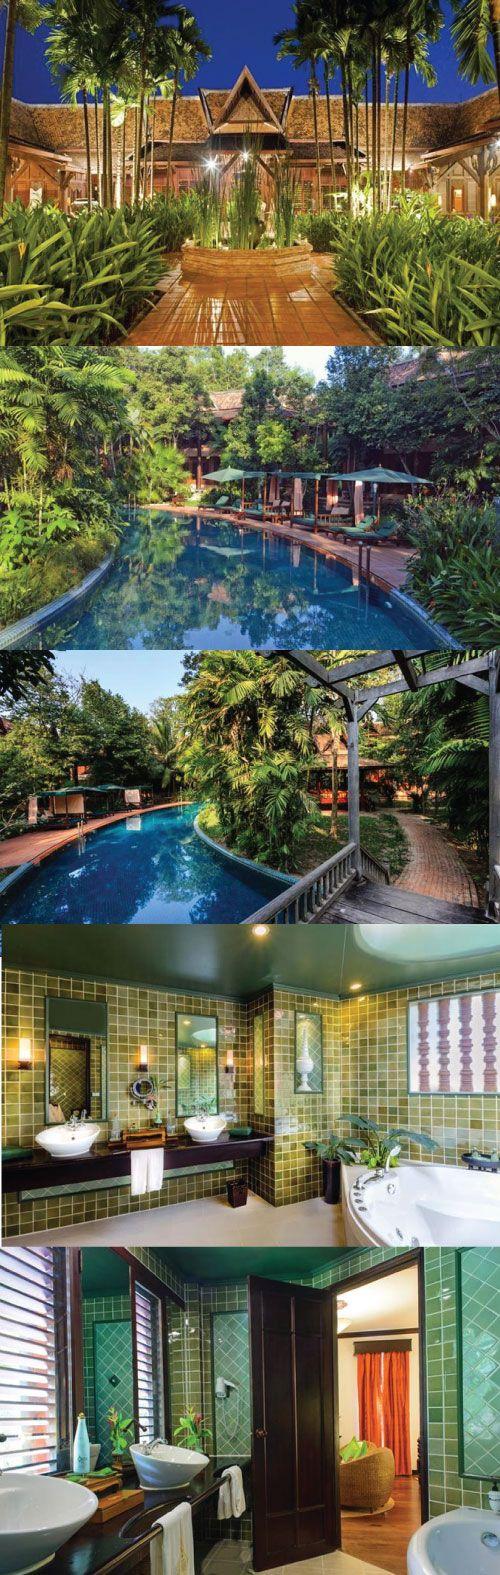 best 107 luxury hotels images on pinterest   travel   luxury